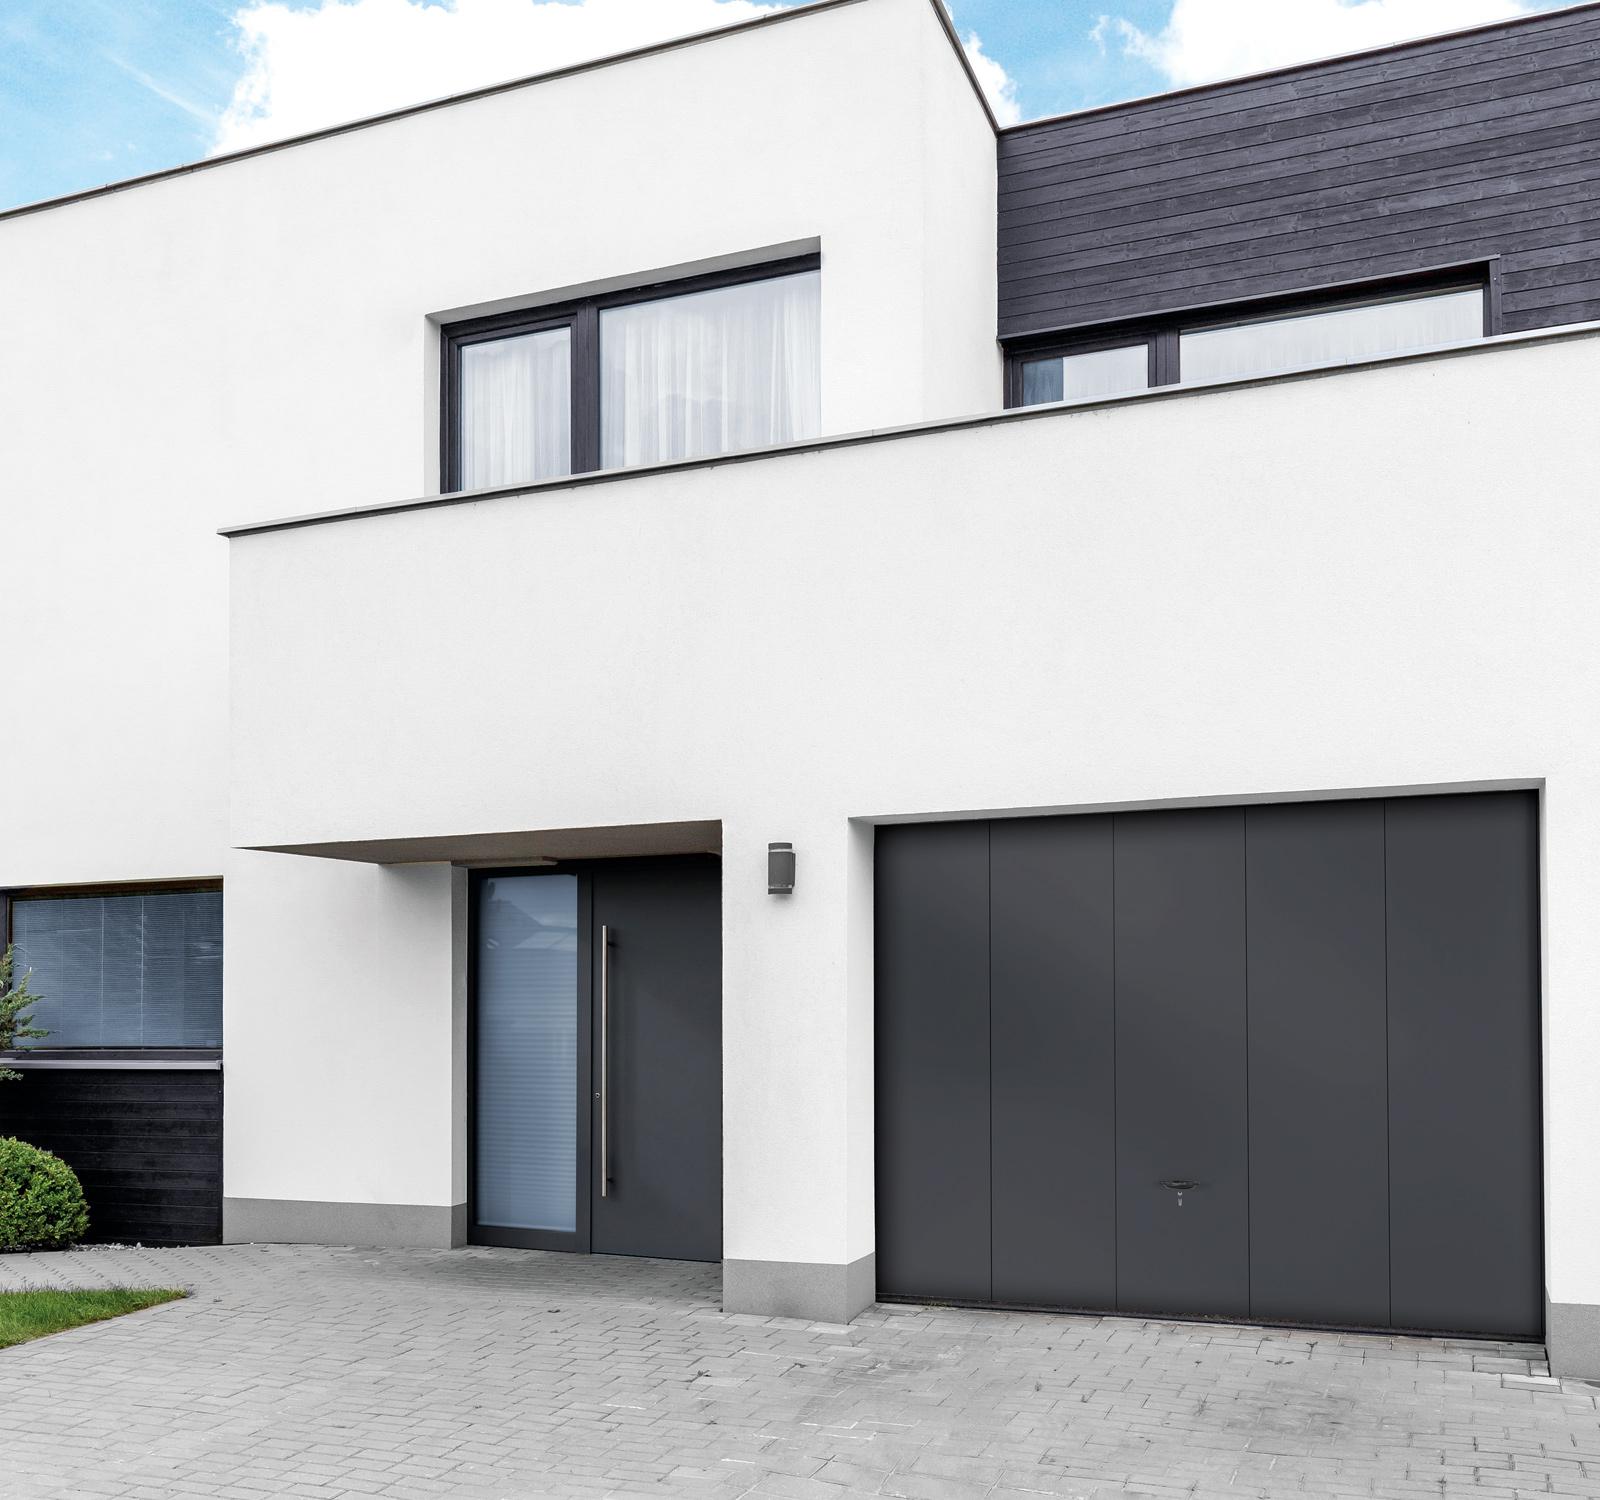 Garagen-Sektionaltor in dark grey